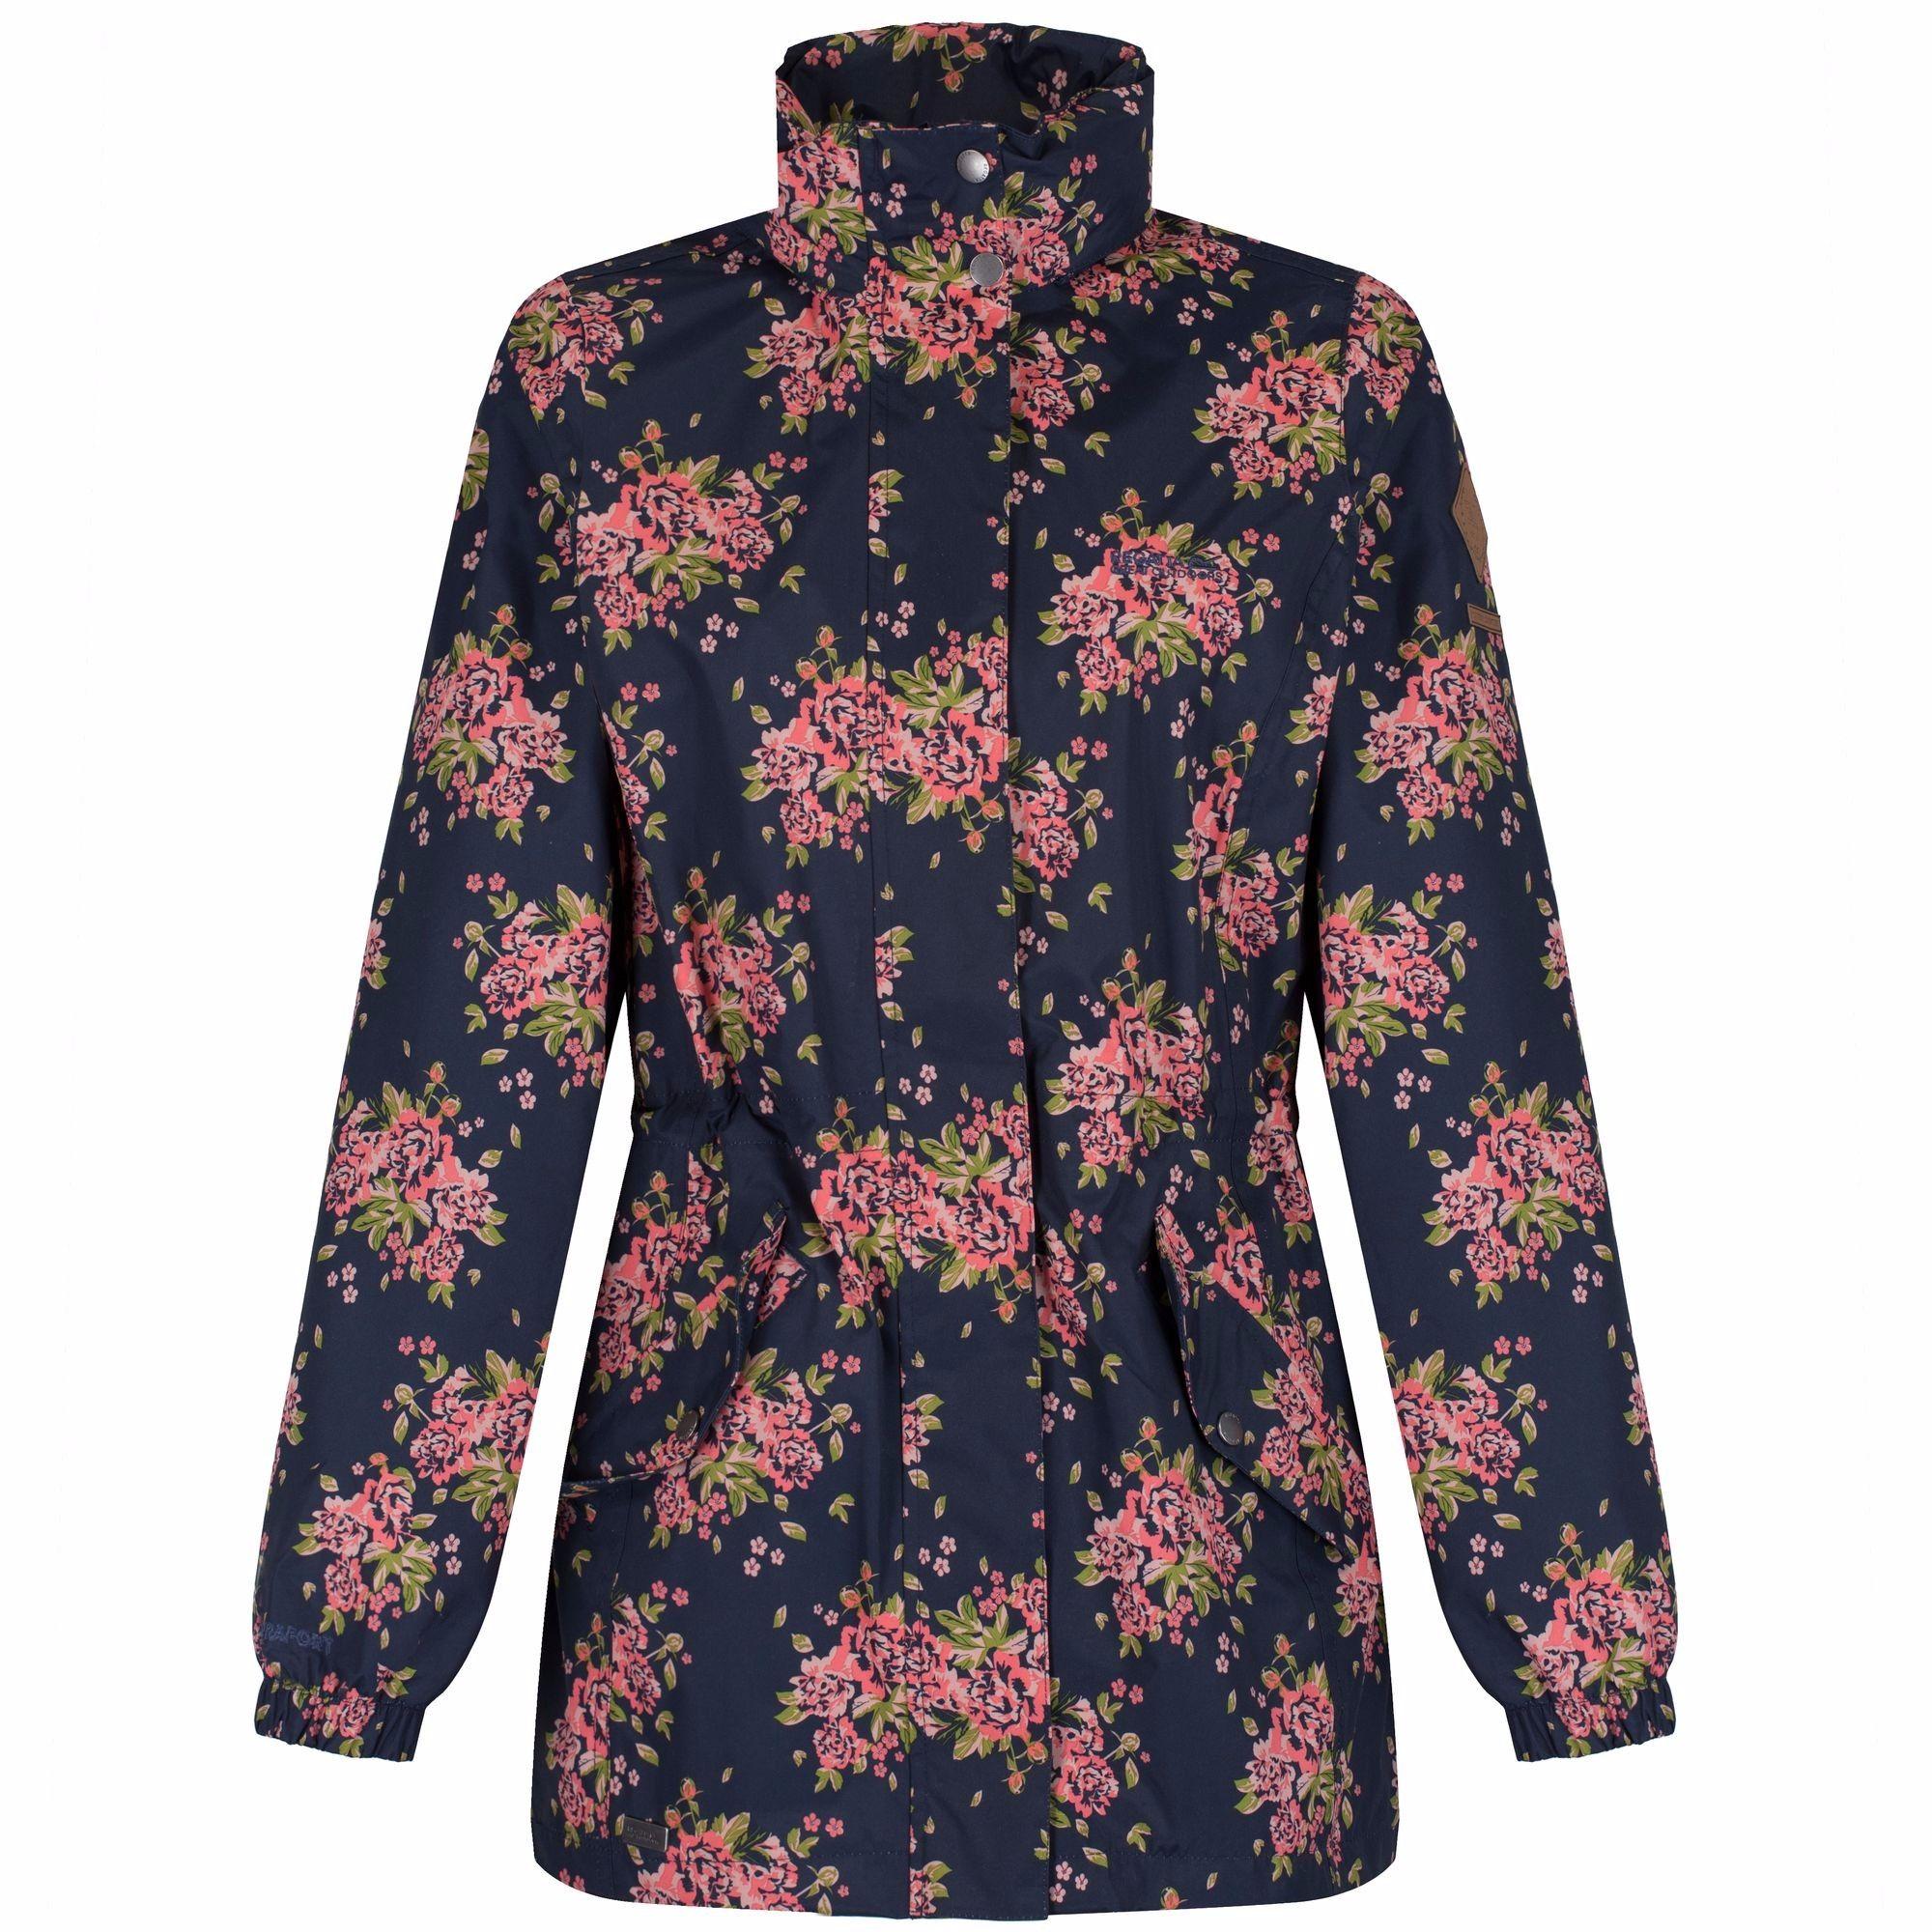 Regatta Great Outdoors Womens/Ladies Pedrina Full Zip Jacket